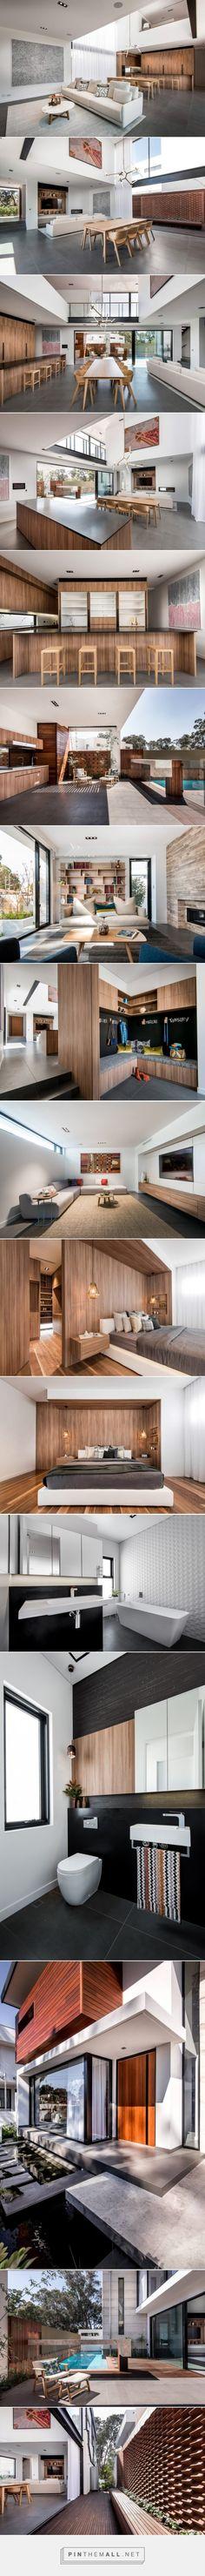 Floreat Residence by Daniel Cassettai Design | HomeAdore - created via https://pinthemall.net